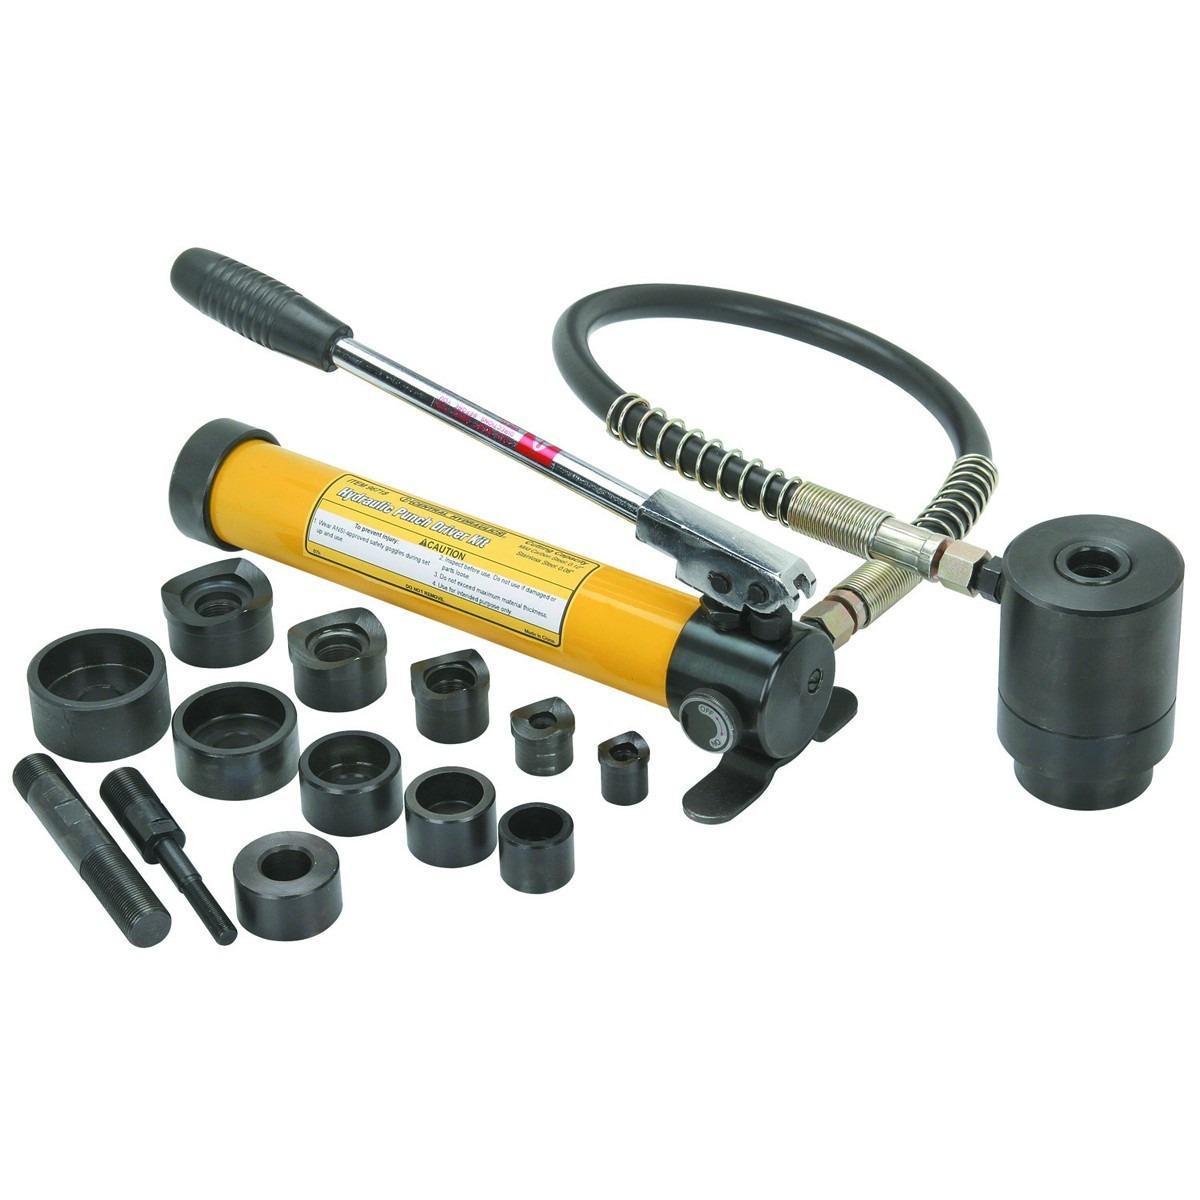 Kit De Perforaci 243 N Taladro Hidraulico Agujeros Perfectos